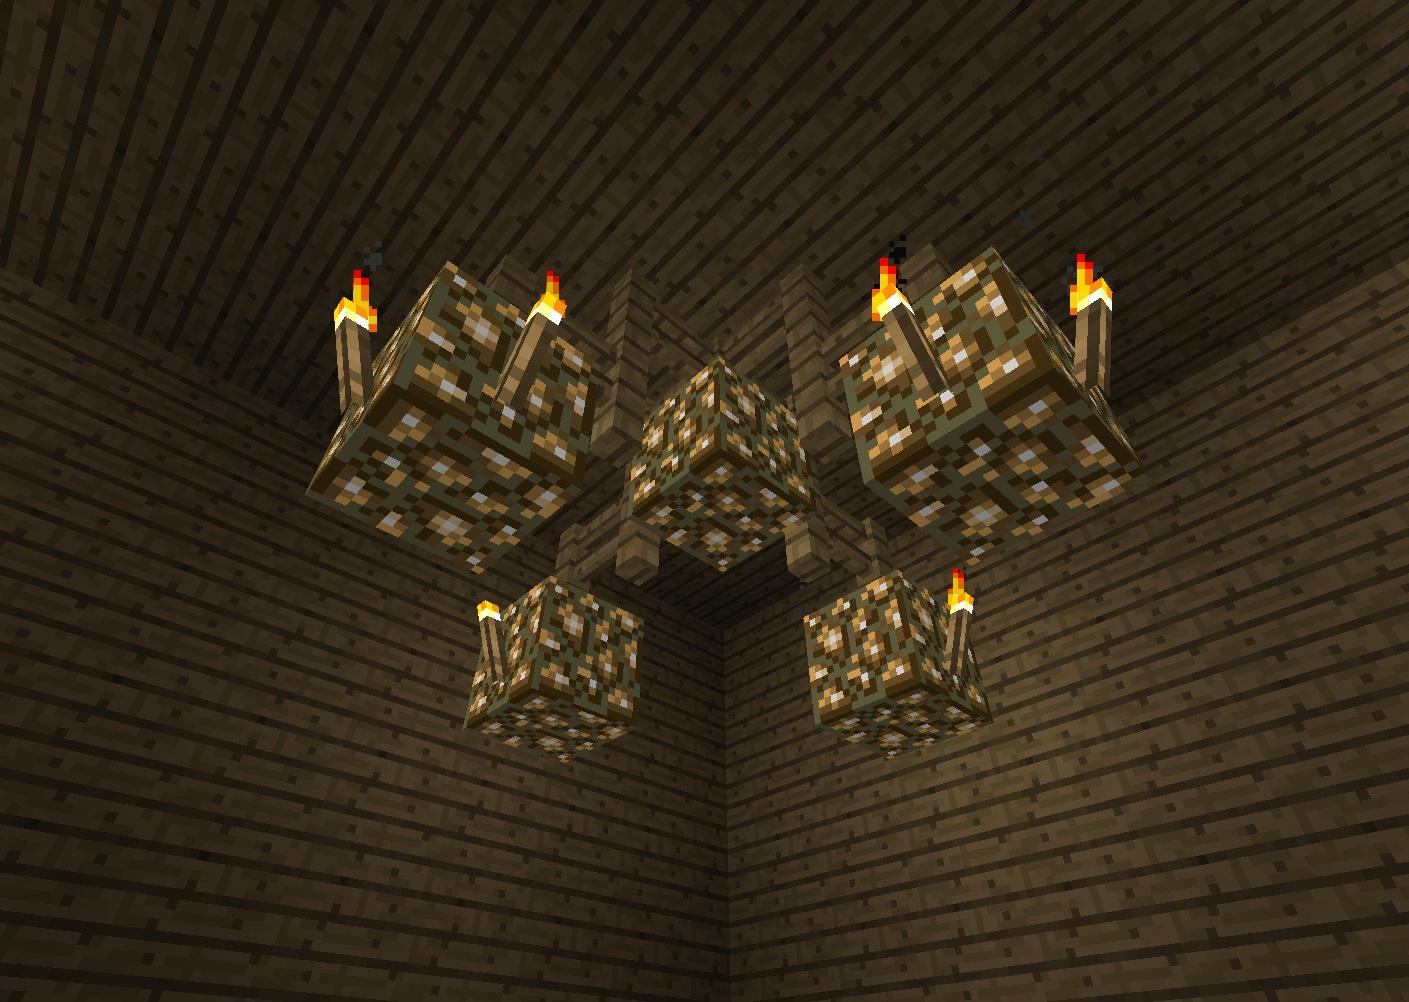 Lighting | Minecraftdesign Wiki | FANDOM powered by Wikia